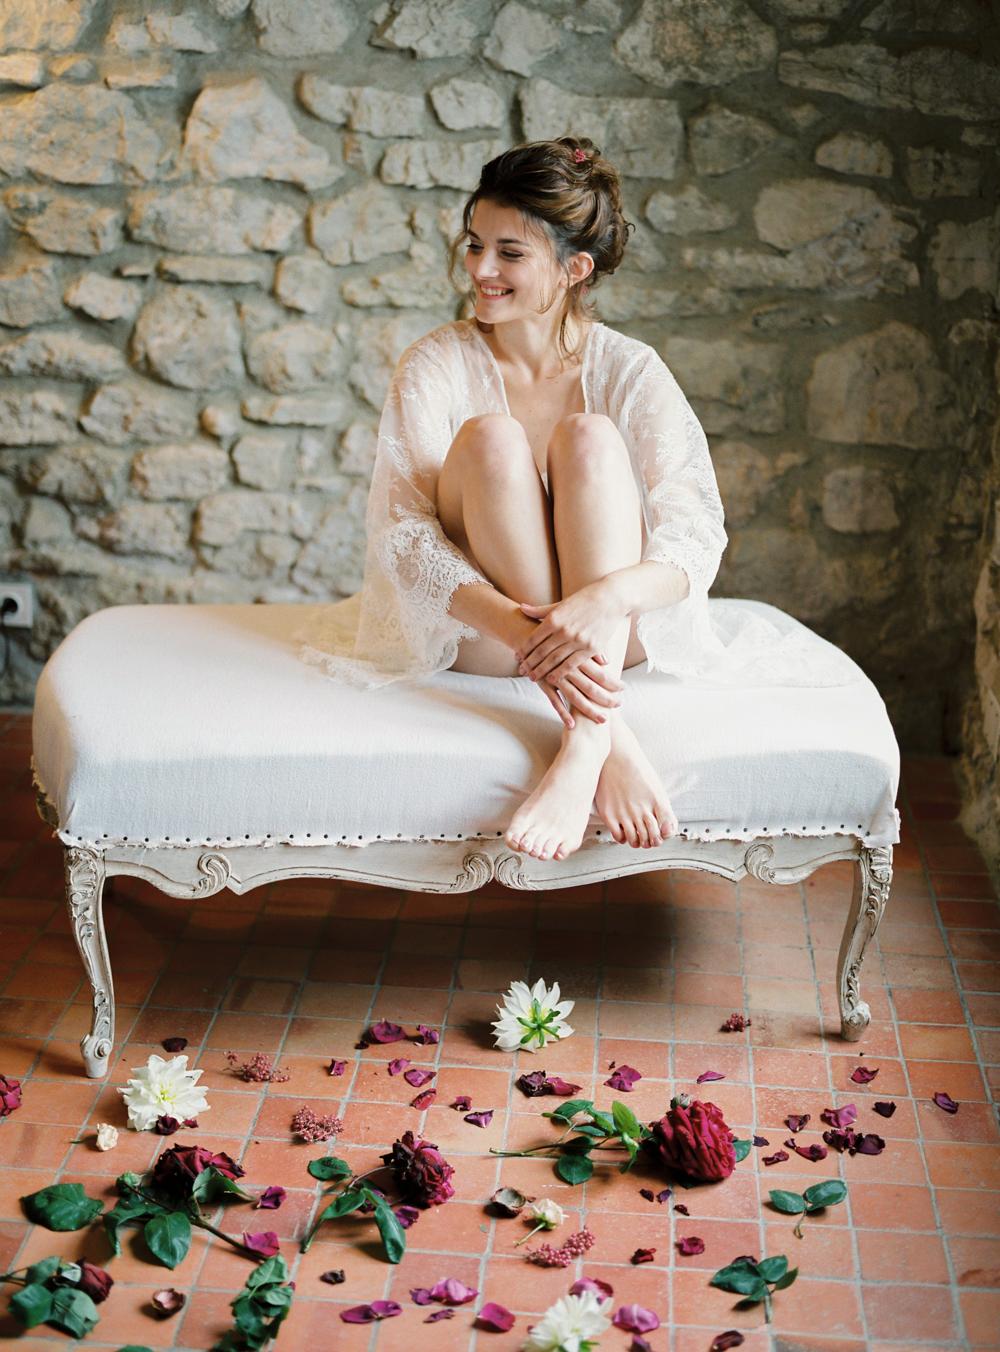 celine_chhuon_photography_Provence_Bride07.jpg